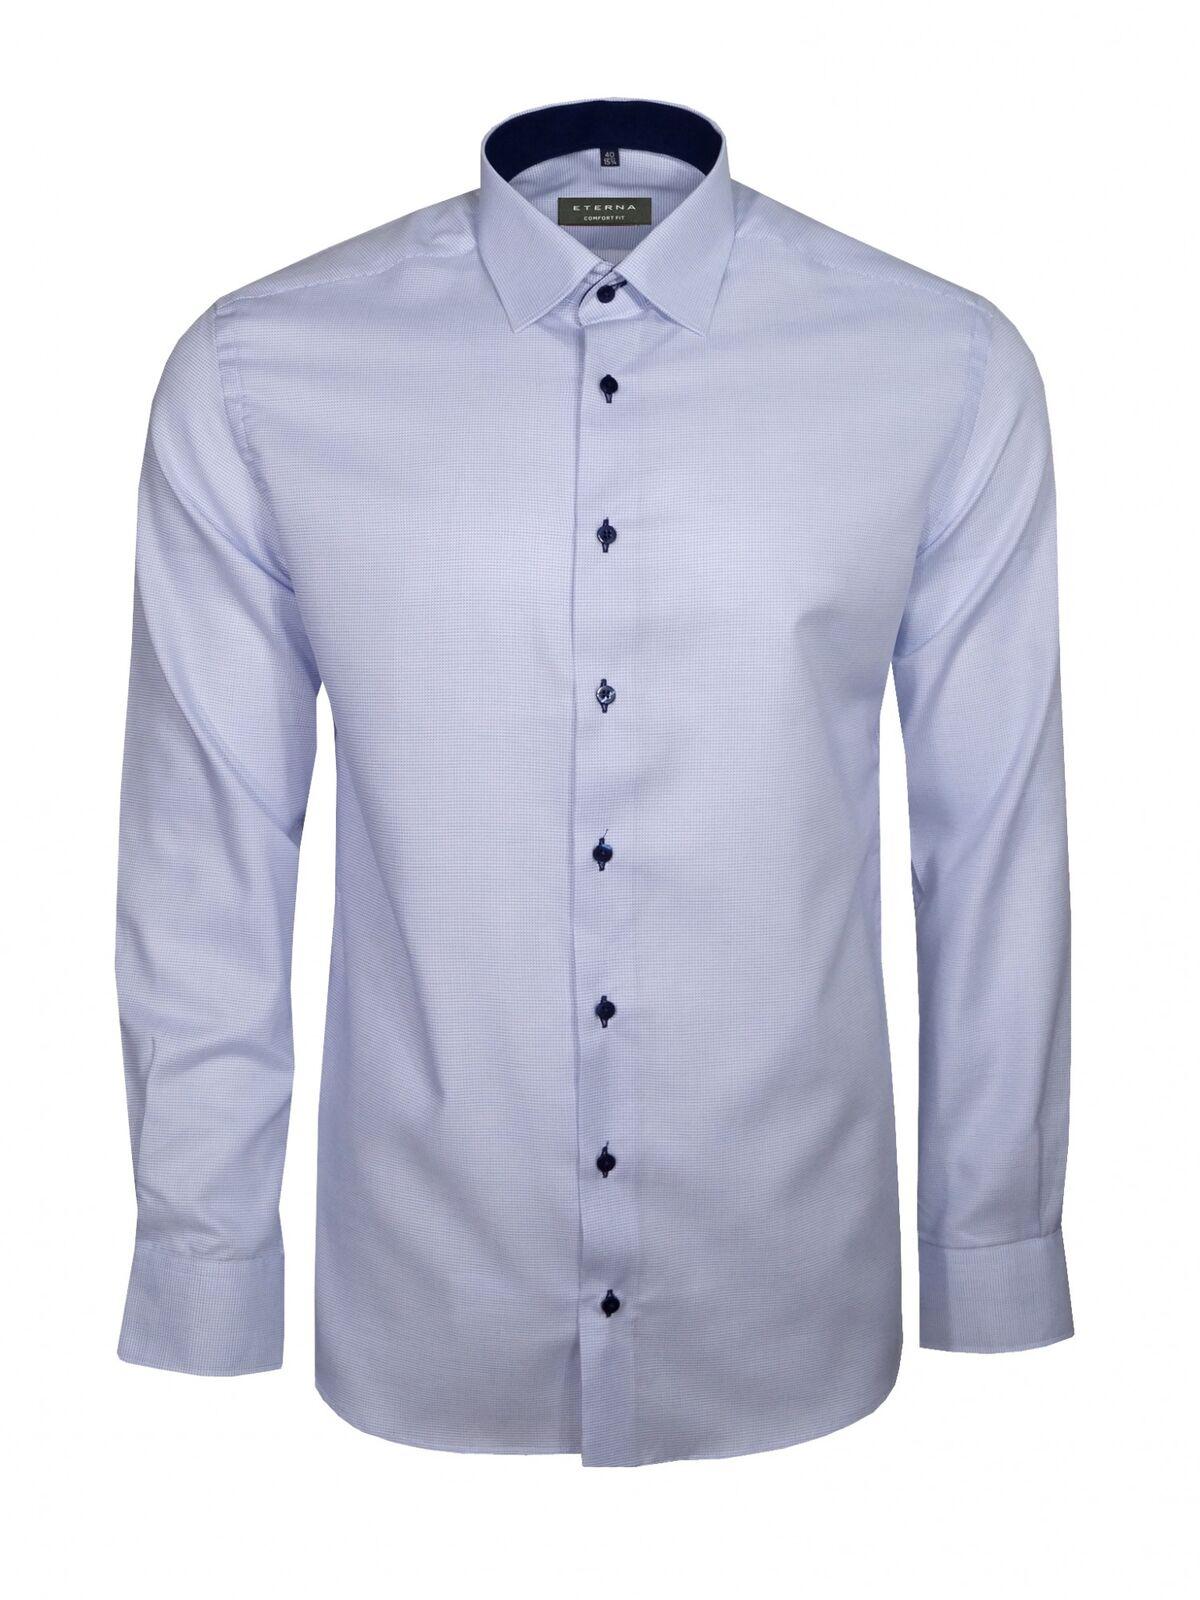 Eterna Herren Hemd Langarm Comfort Fit 4671 11 E147 Blau Strukturiert XXL 45 | Verschiedene Waren